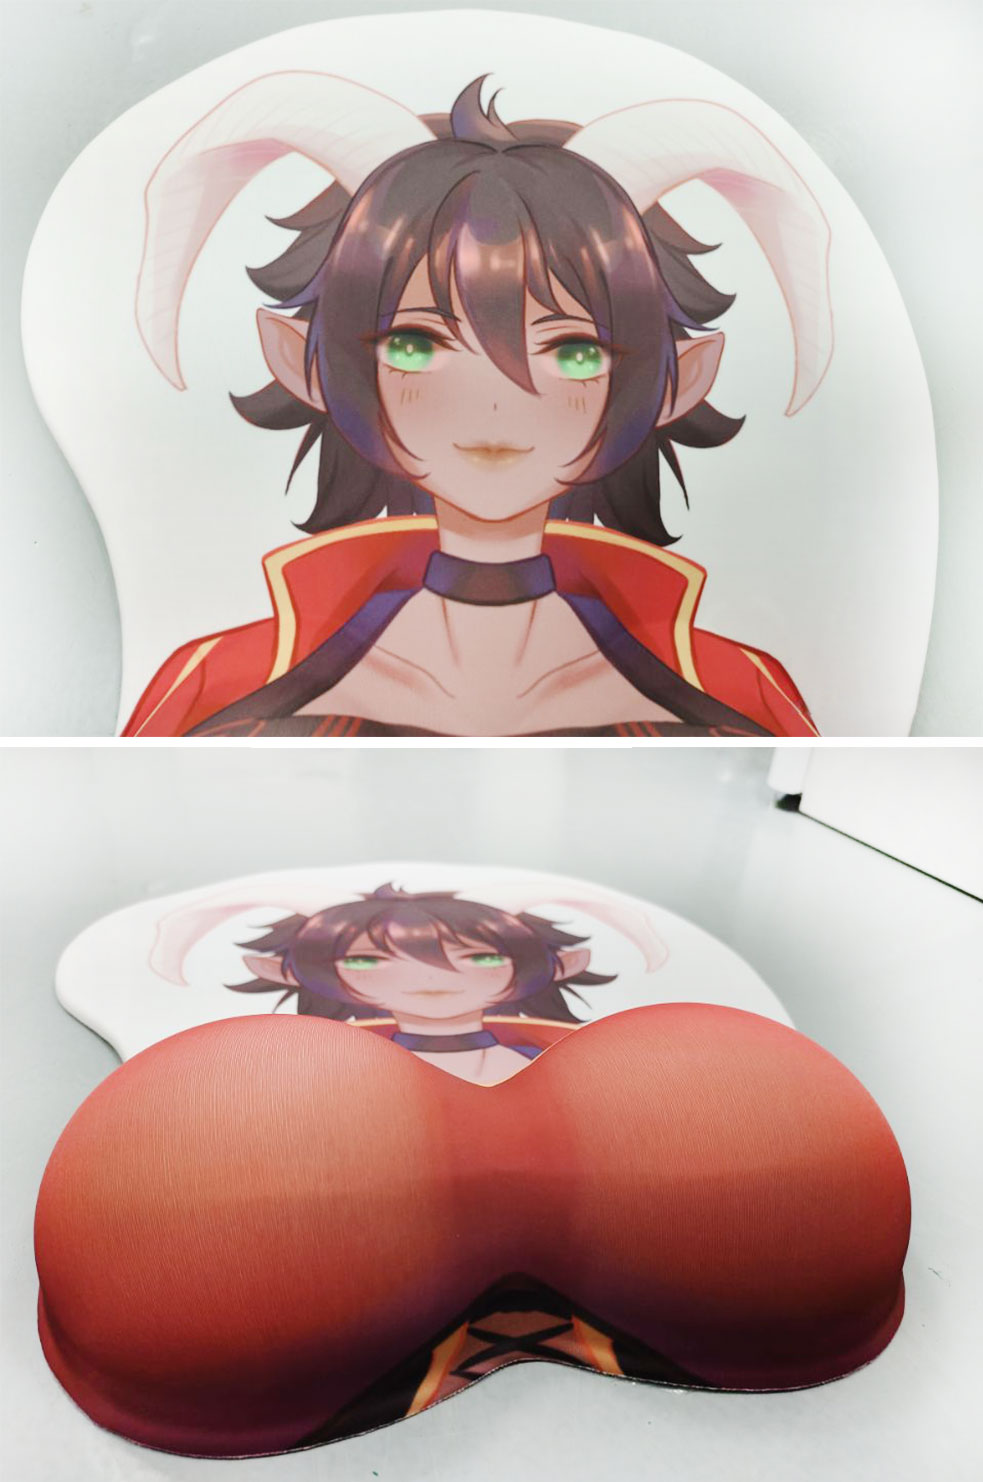 tamamo no mae life size oppai mousepad 3808 - Anime Mousepads